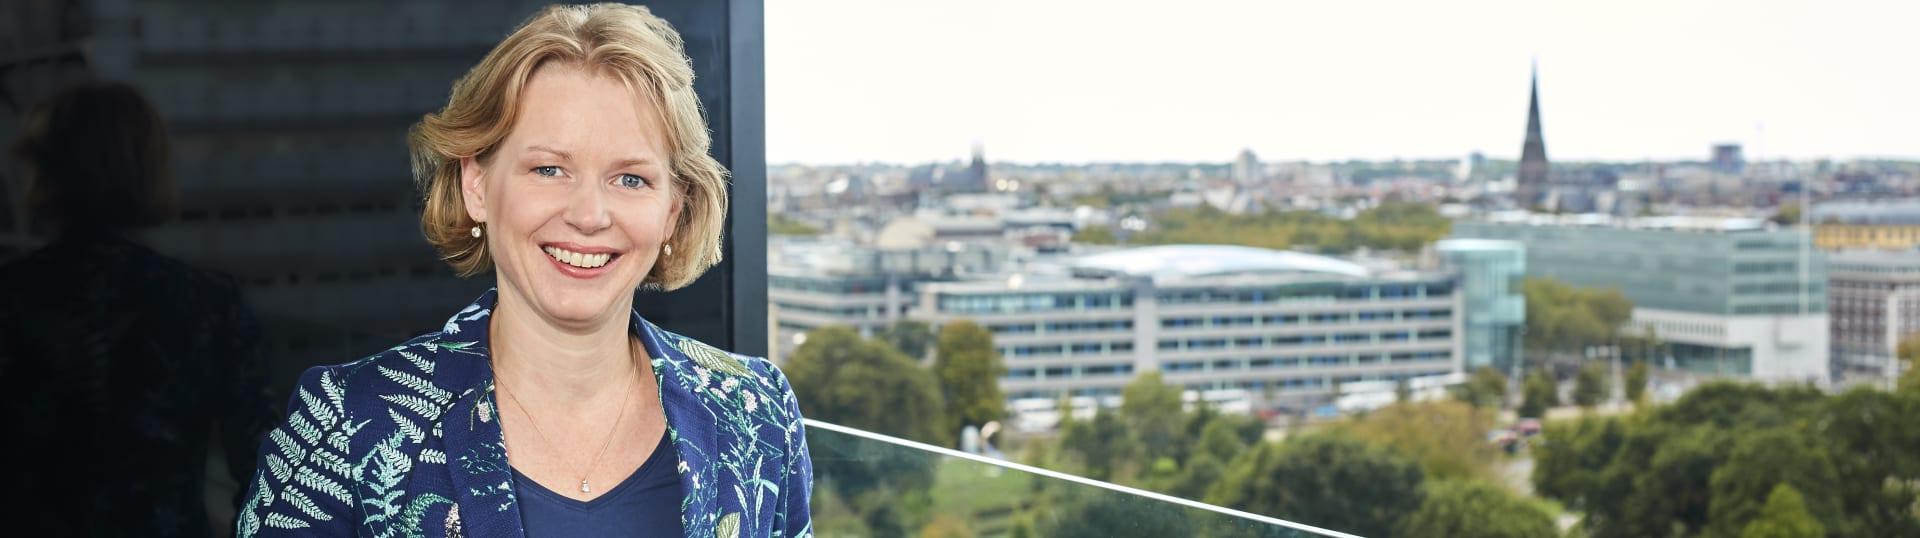 Marleen Botman, advocaat Pels Rijcken